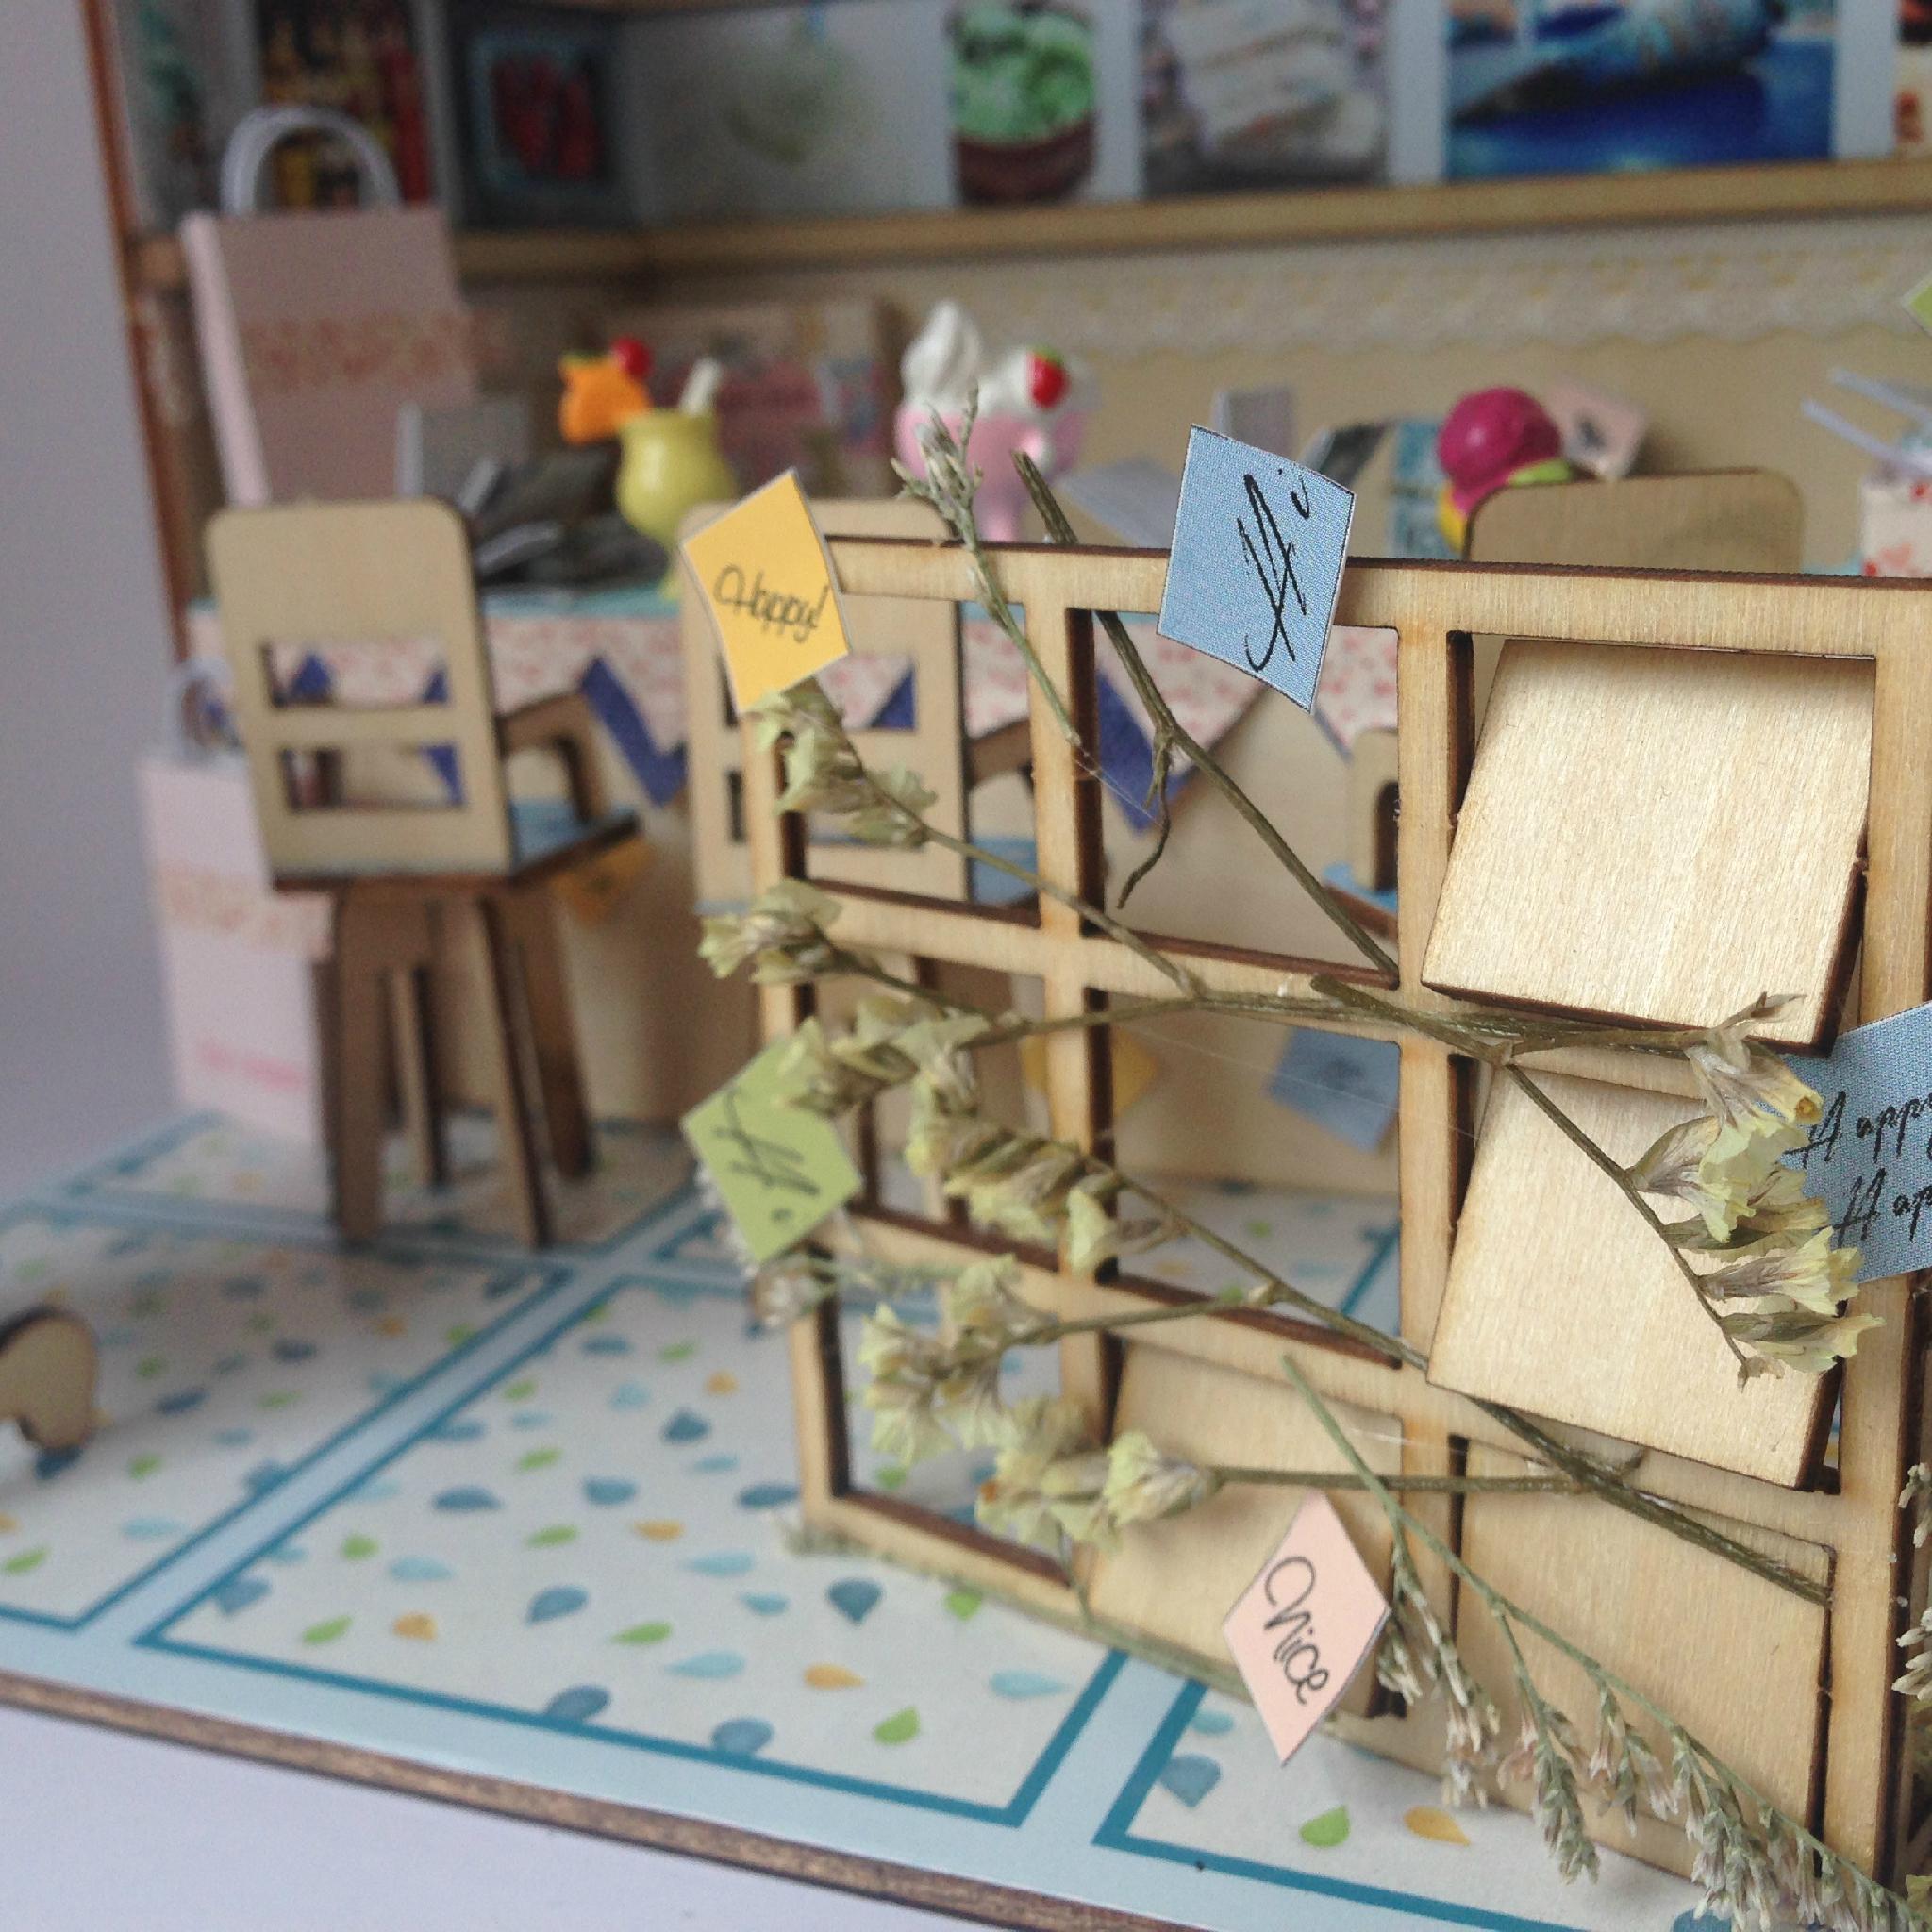 Ice cream house   plan toy   model building   DIY house  wooden  art 5